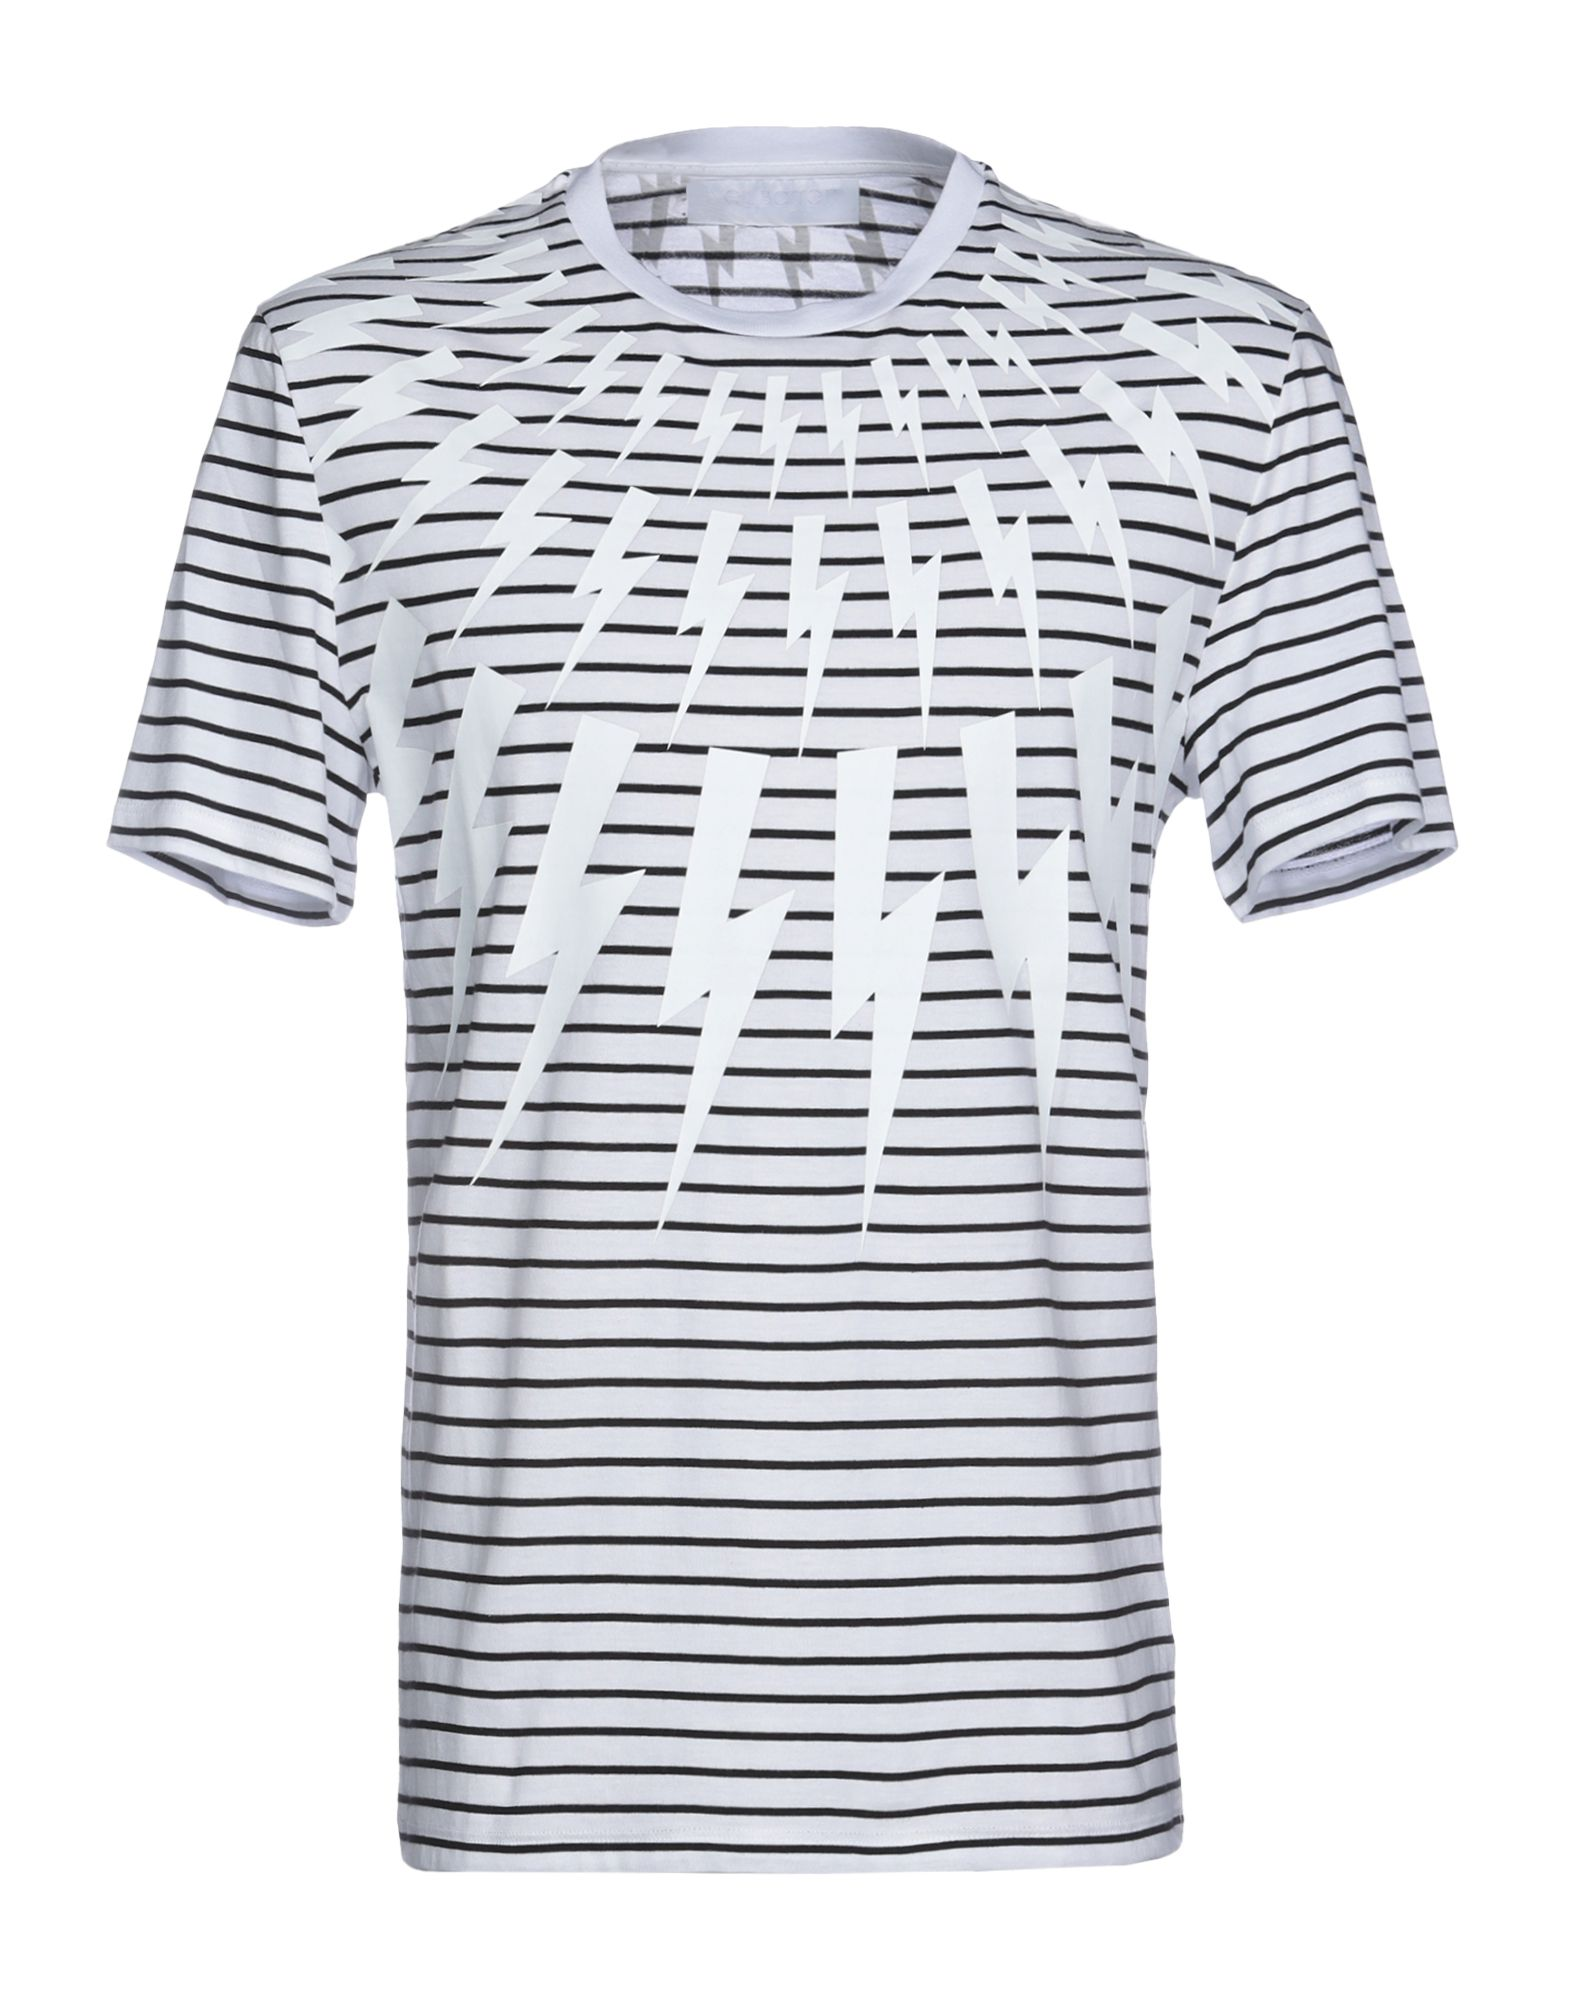 NEIL BARRETT Футболка neil barrett хлопковая рубашка в полоску page 2